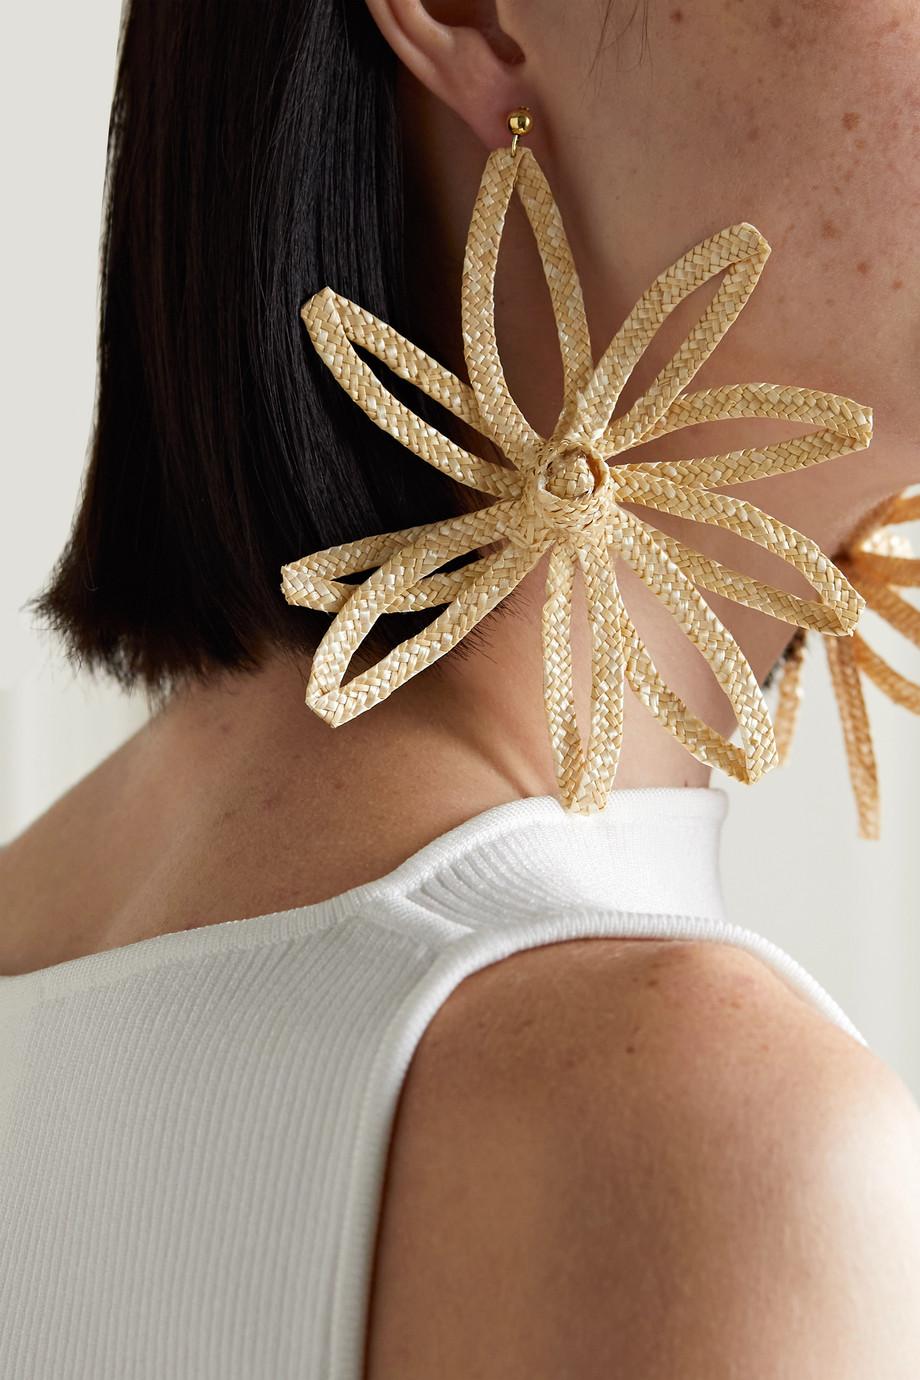 Cult Gaia Lani woven straw earrings